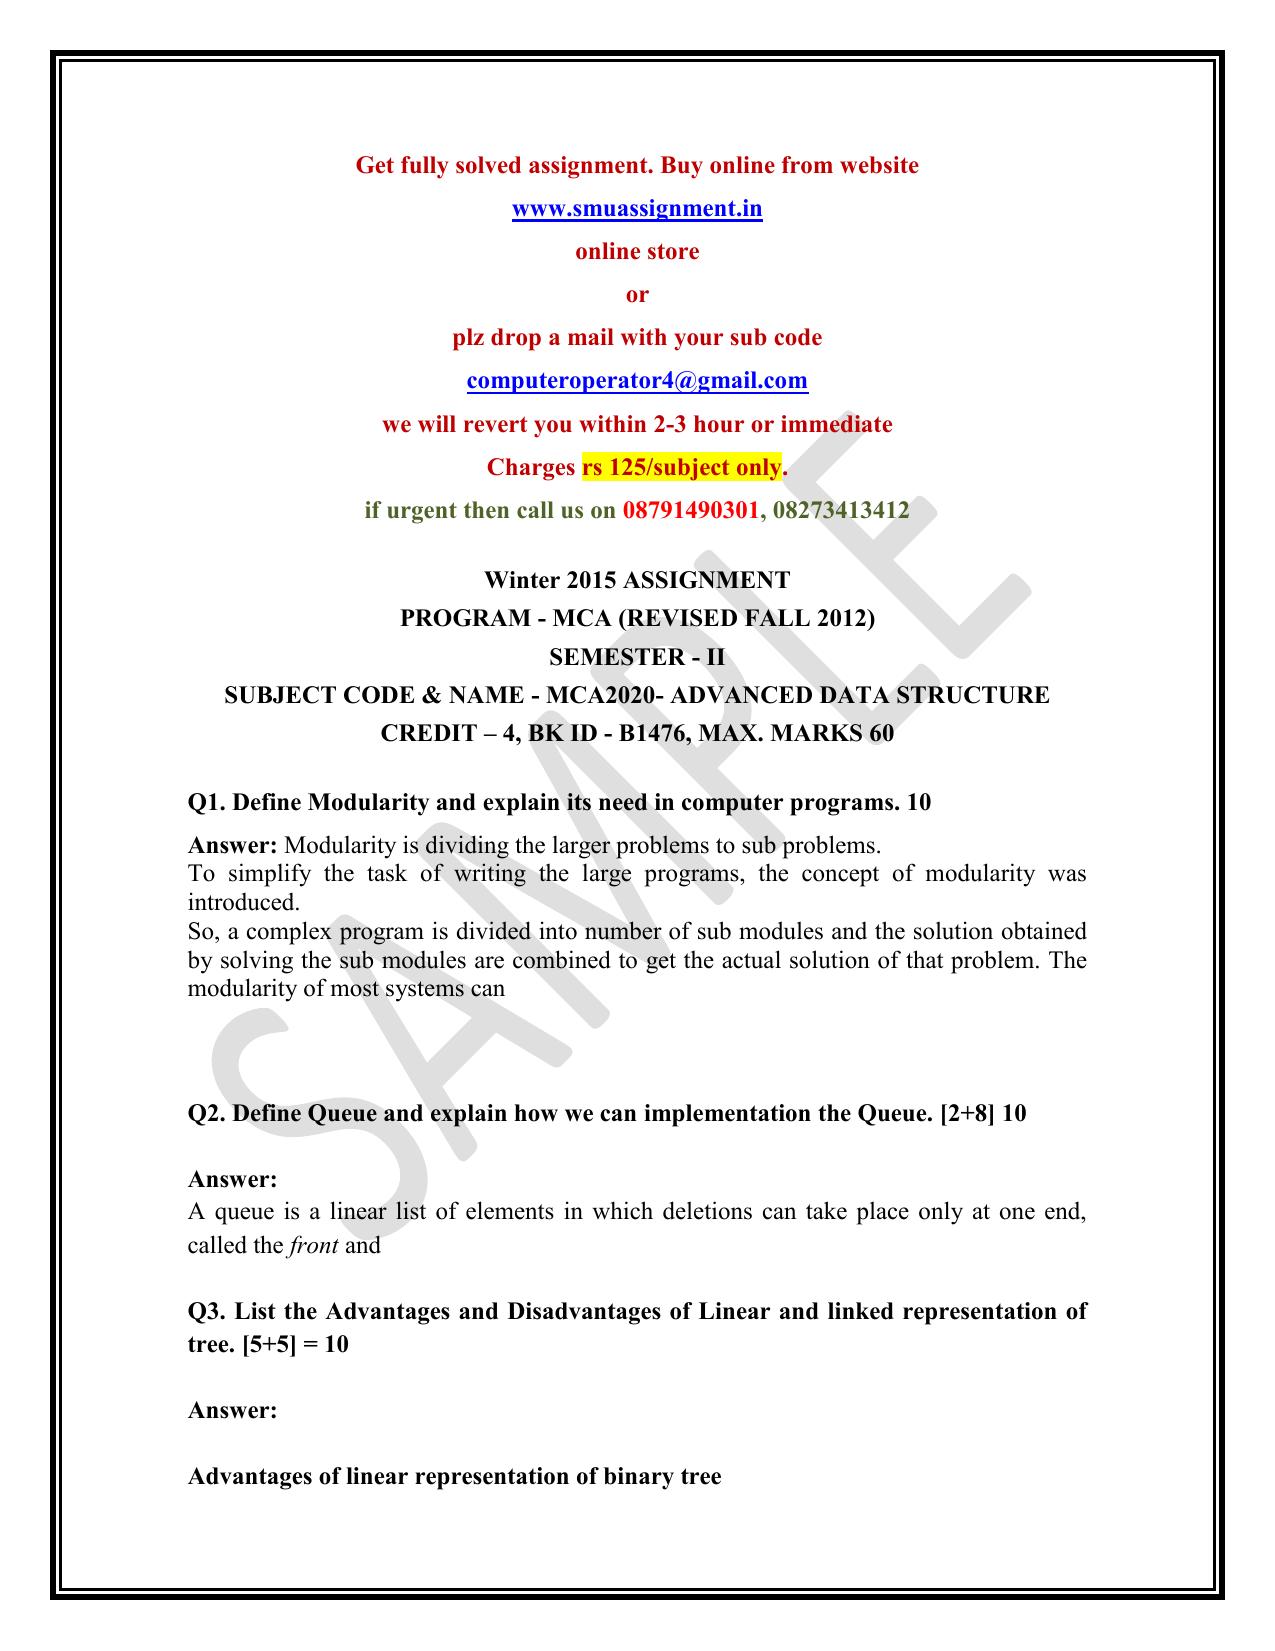 mca2020 - SMU Assignments